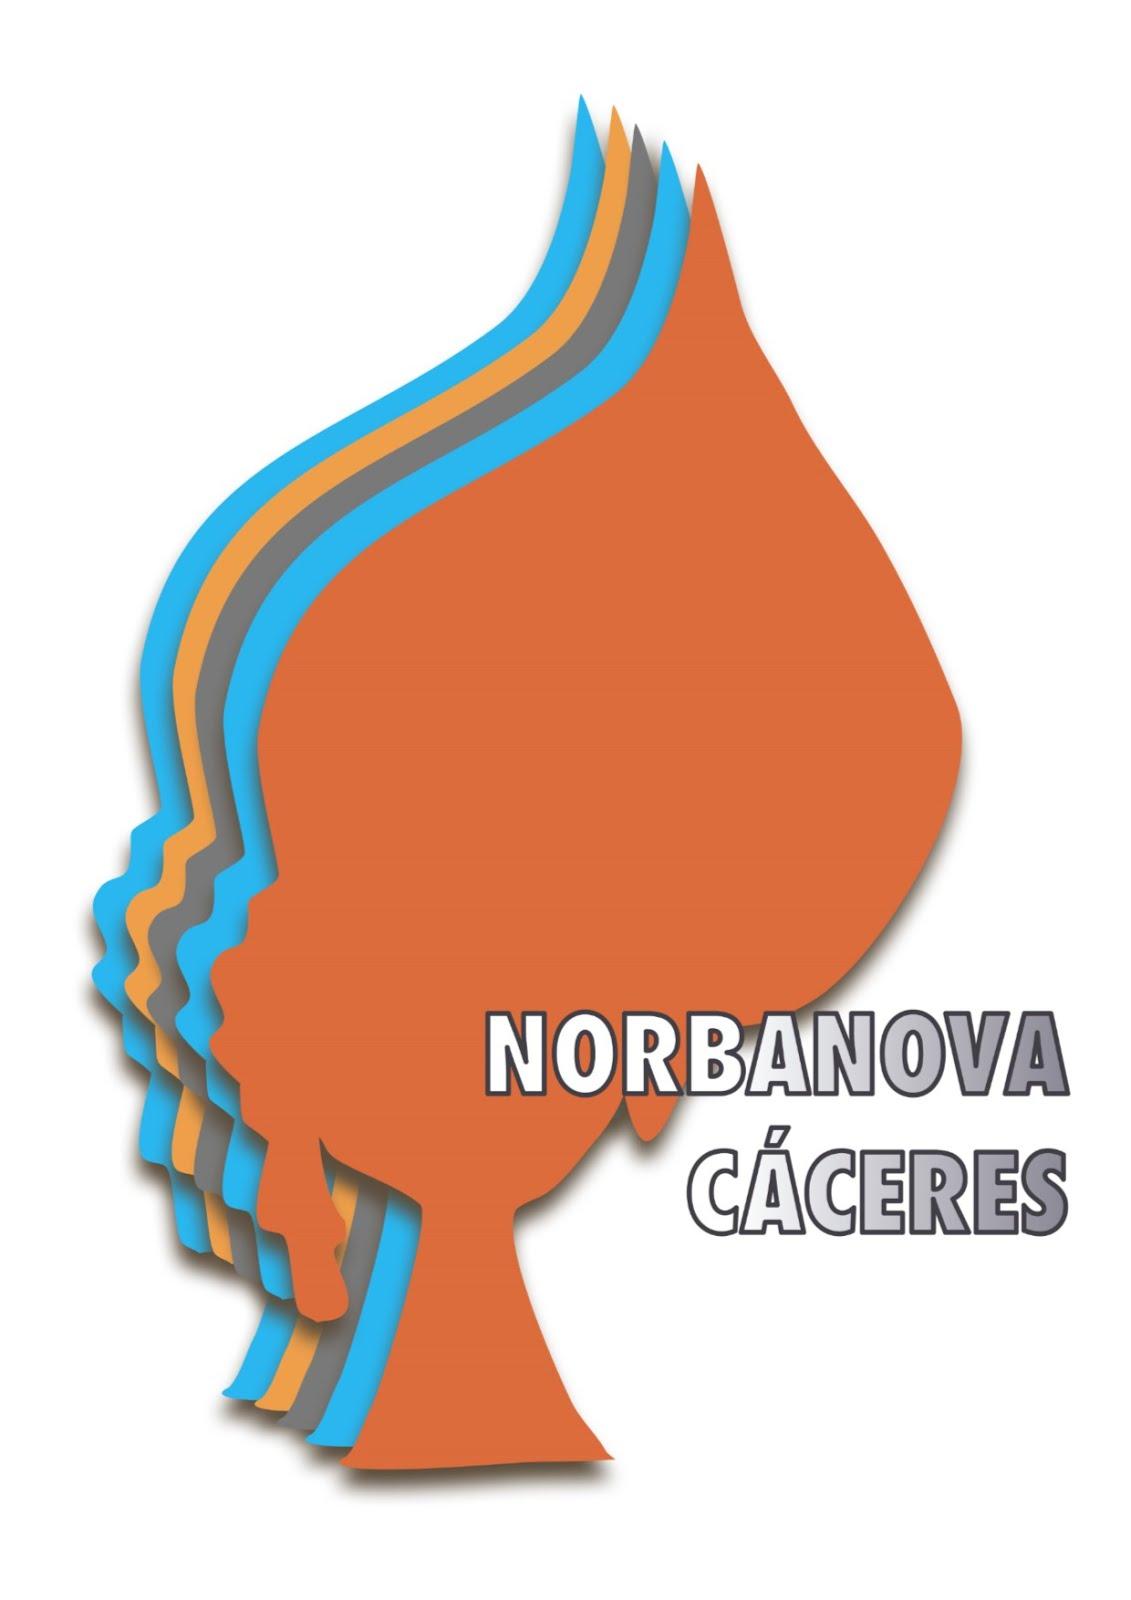 NORBANOVA CÁCERES